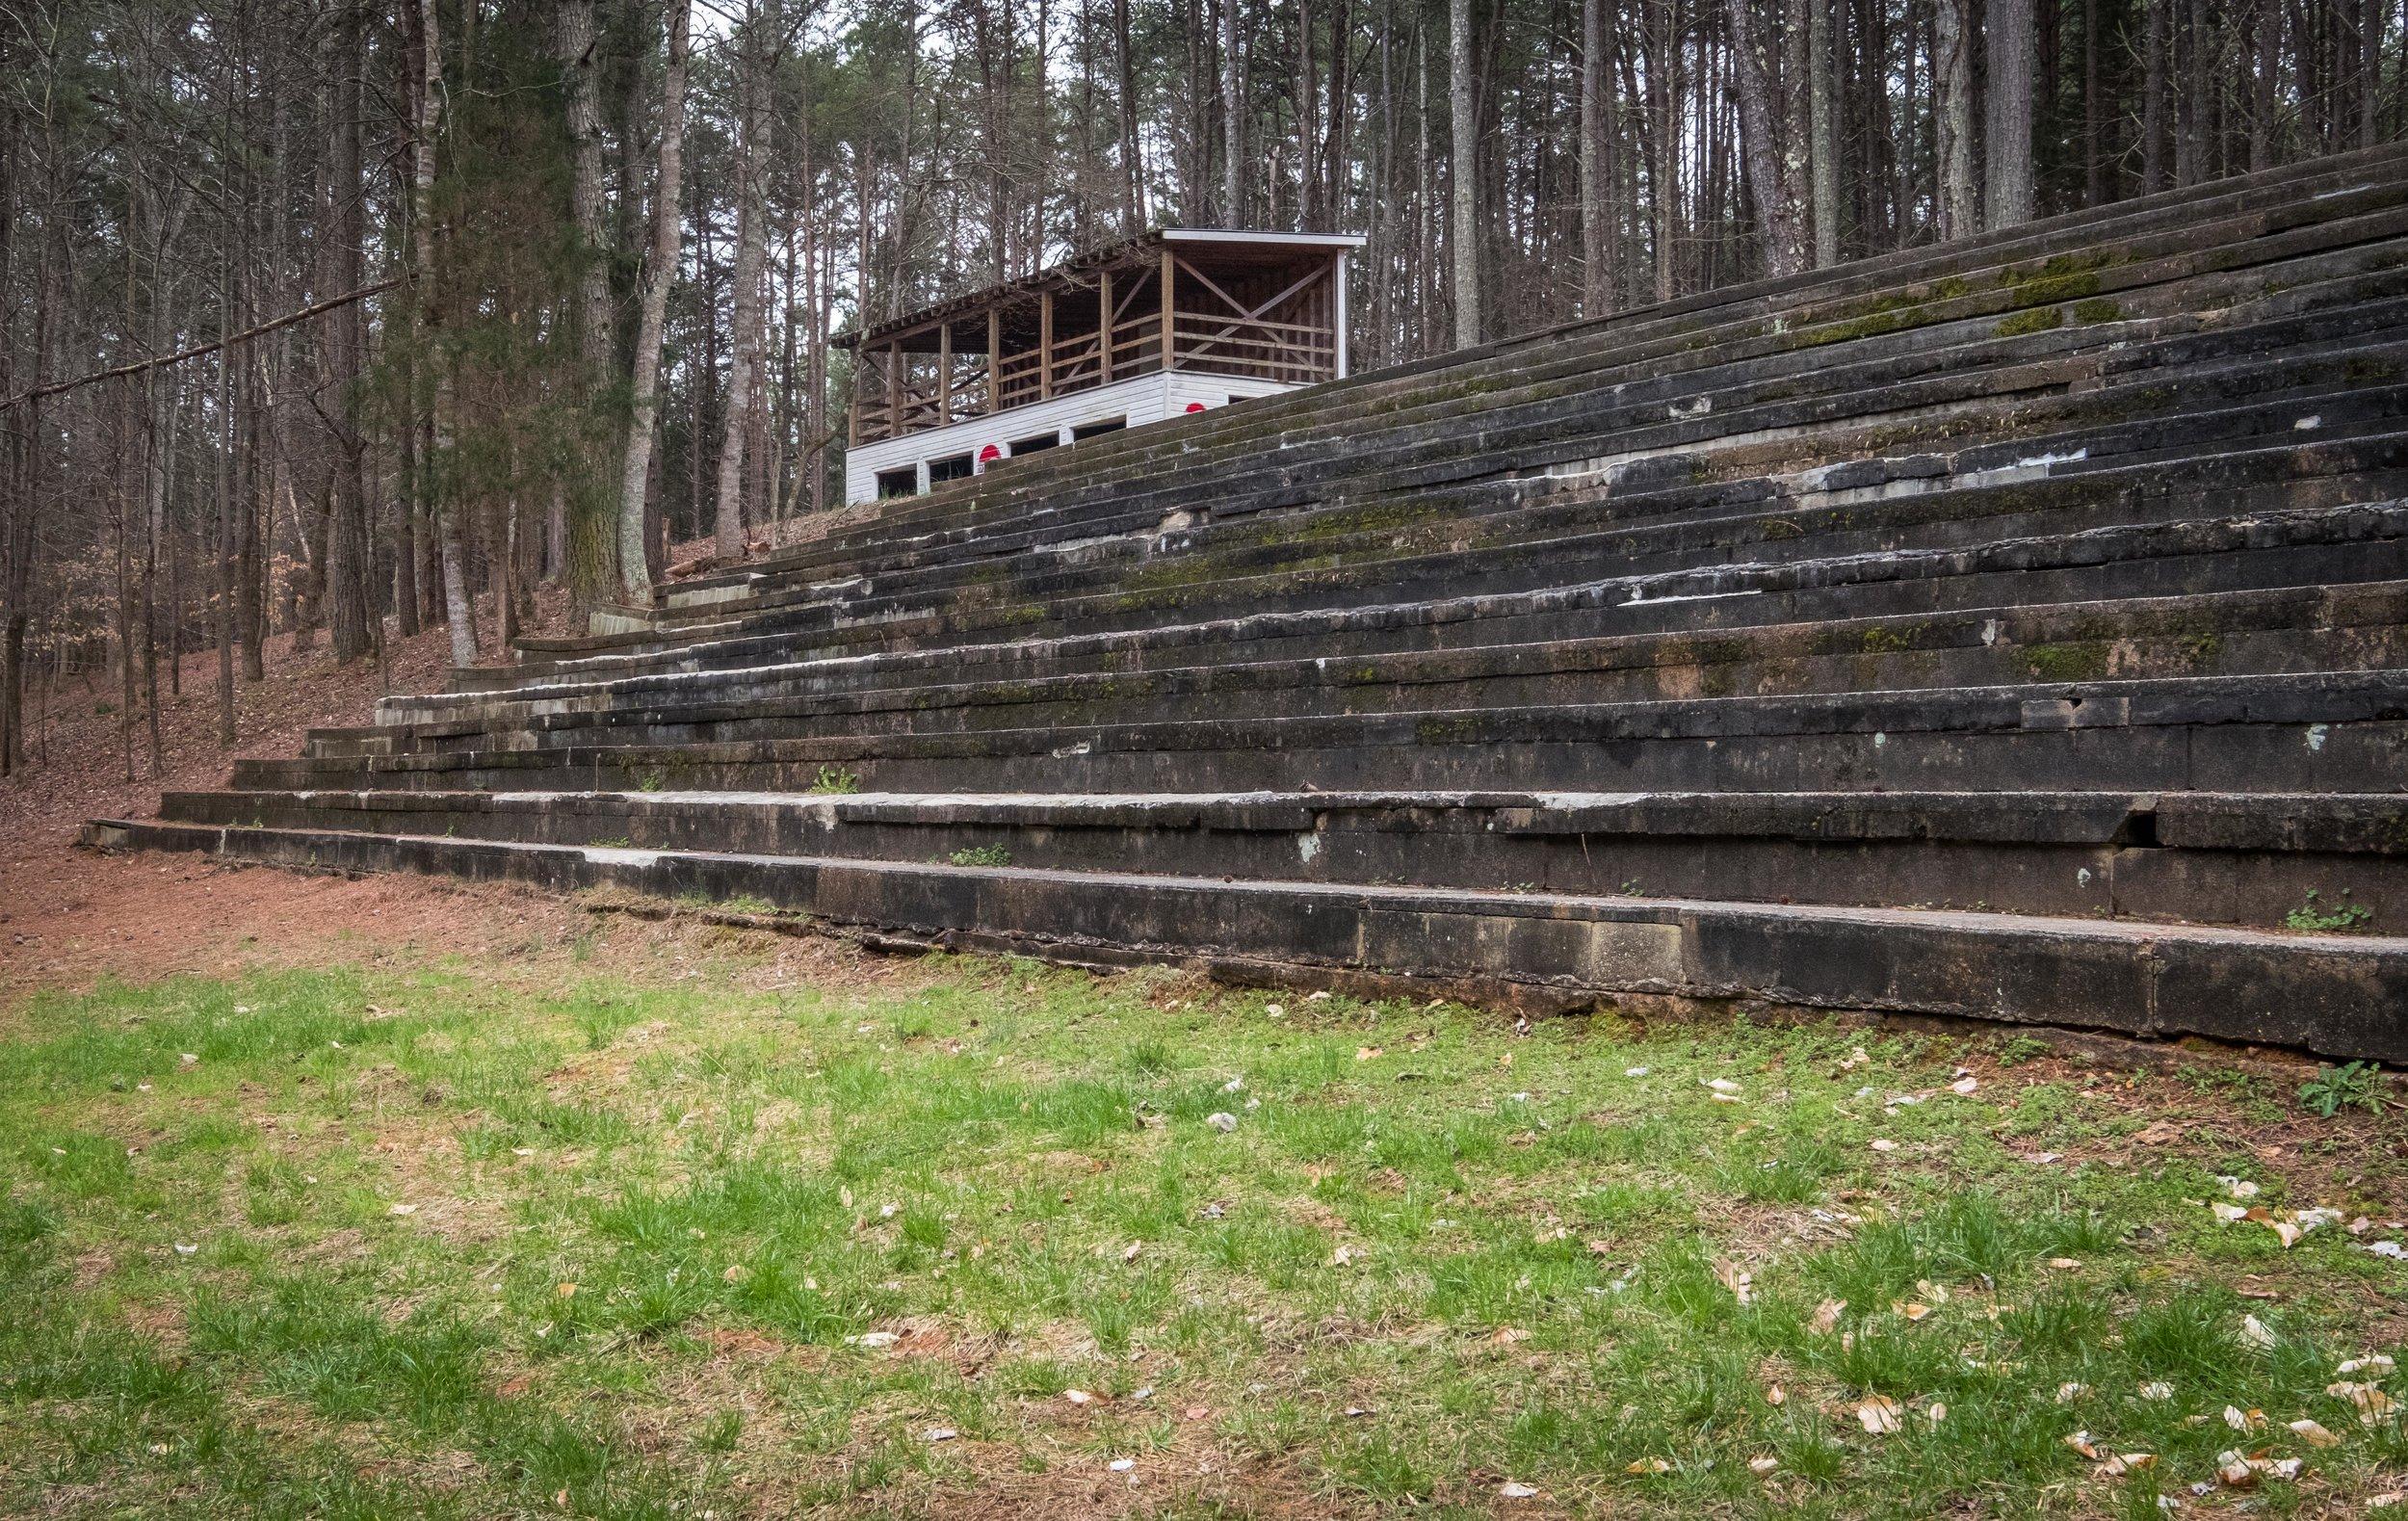 Concrete grandstands and refreshment stand